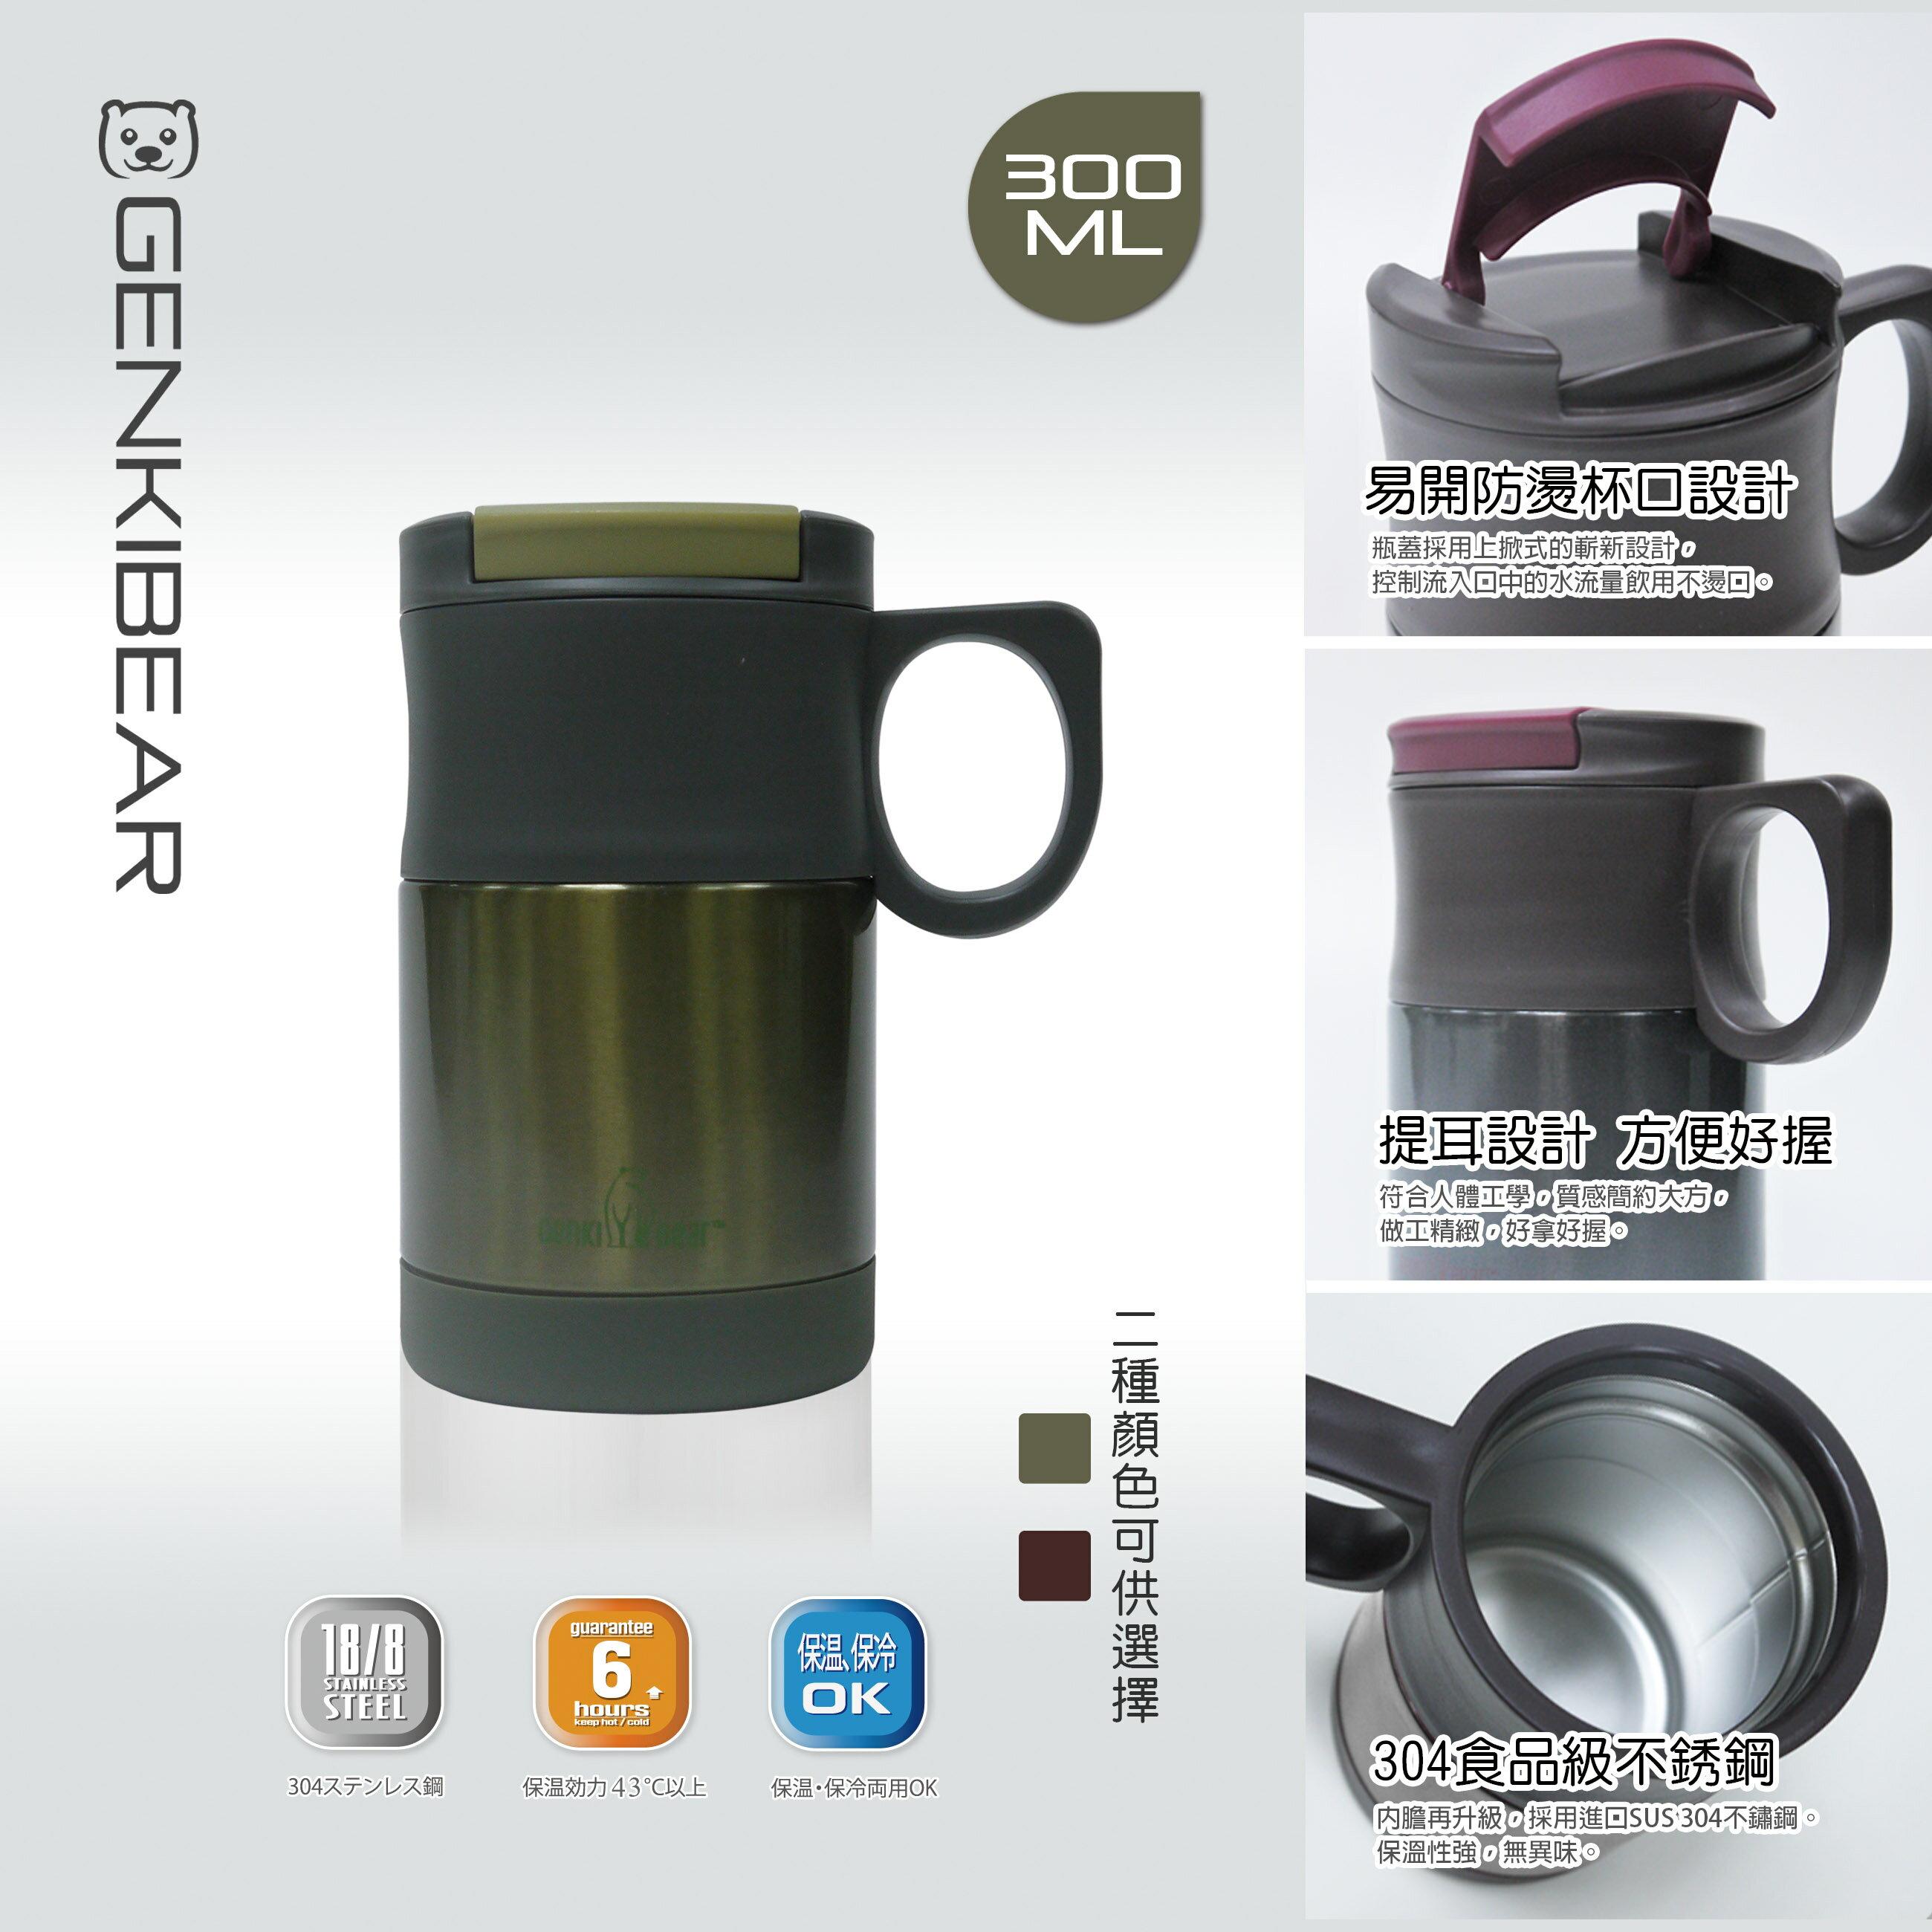 GENKI BEAR 辦公獨享冰霸杯300ml 2色可選(保溫保冷皆可!)